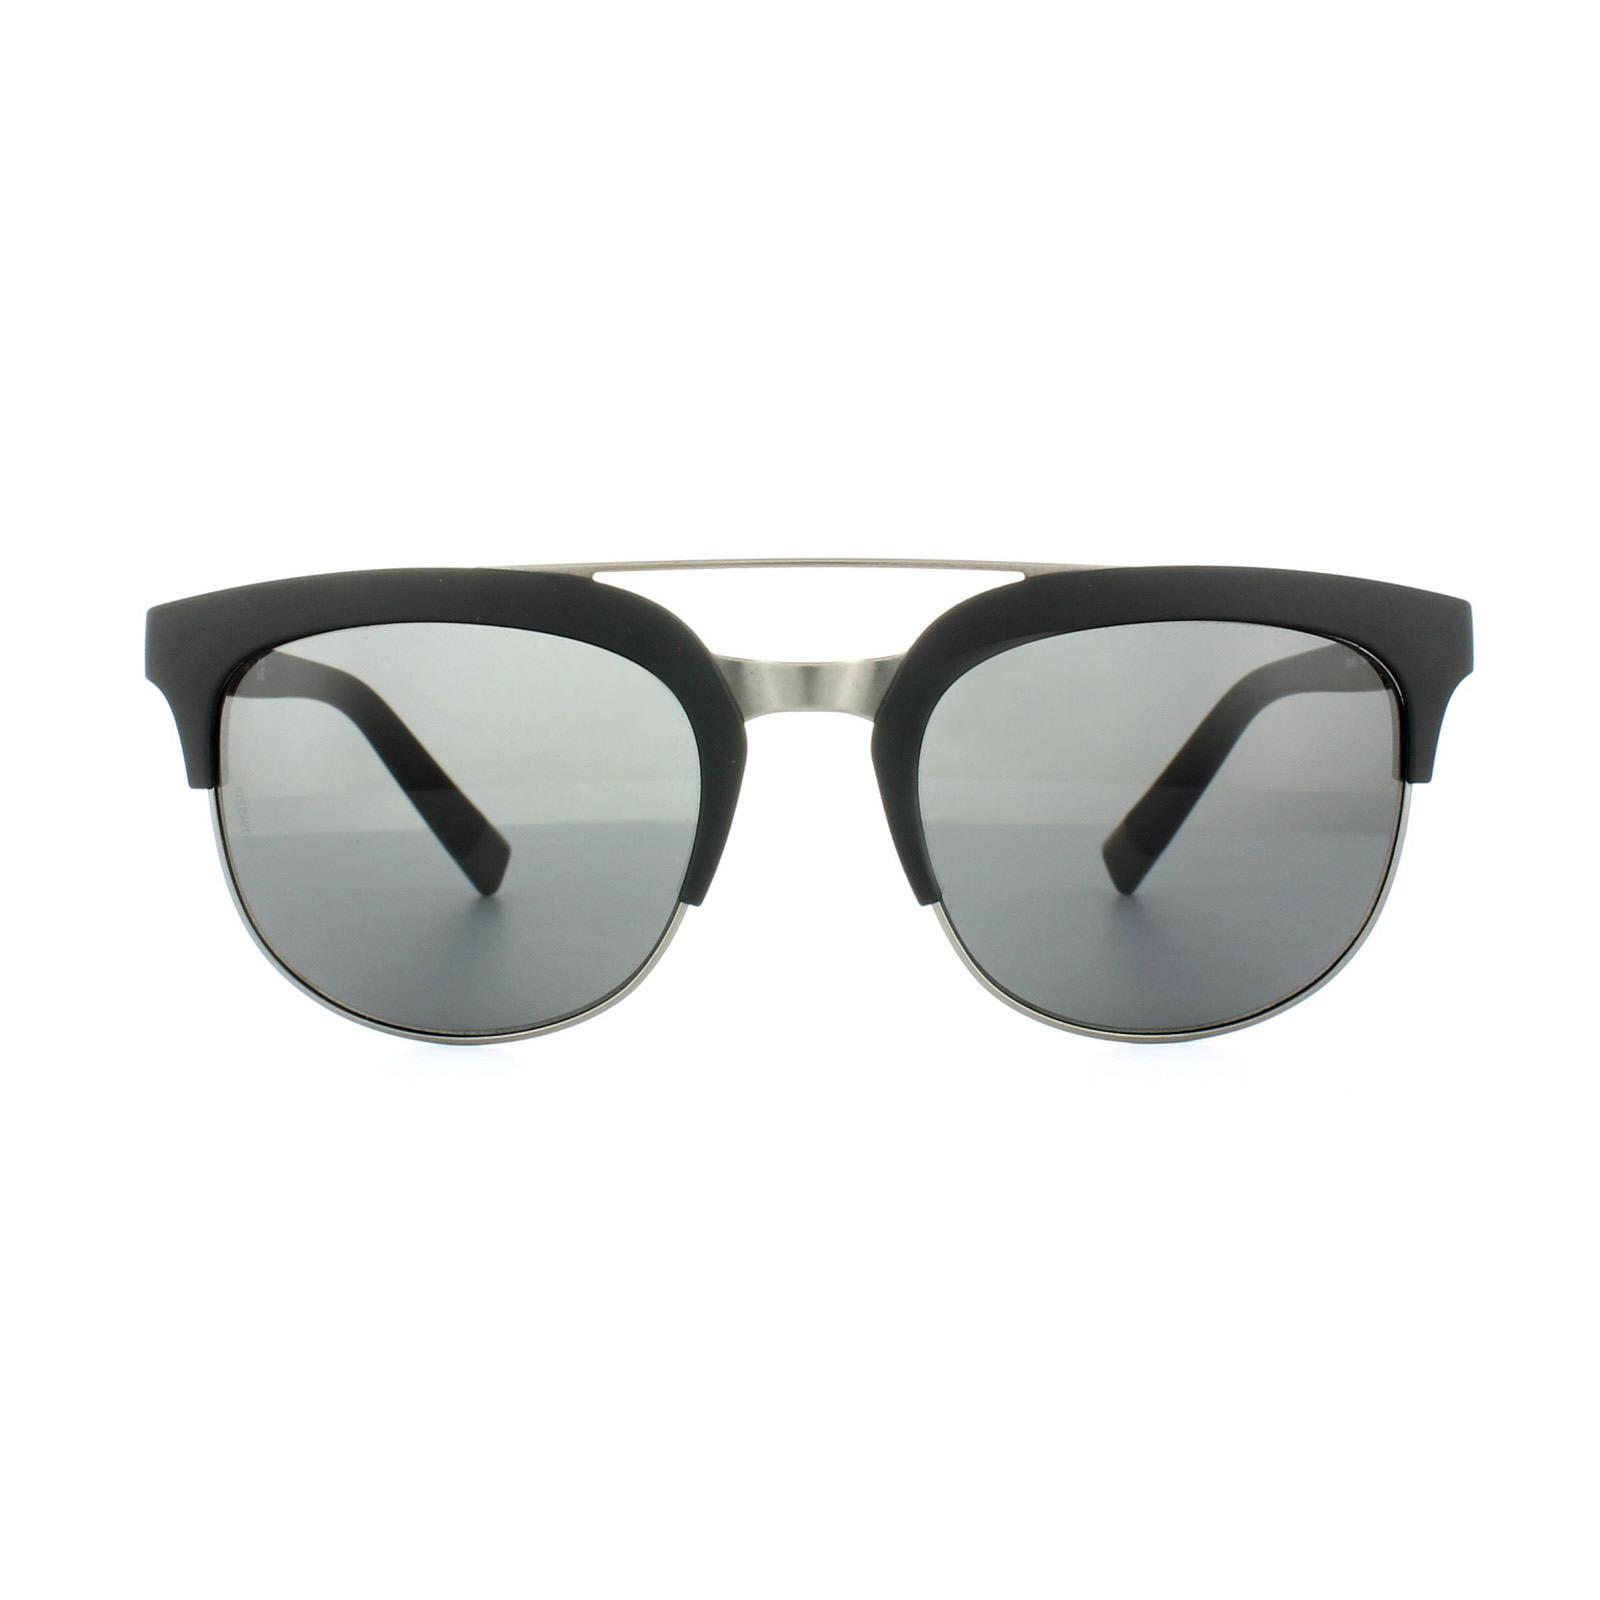 Sentinel Dolce   Gabbana Sunglasses 6103 1934 87 Matt Black Grey eb0ce205ad25